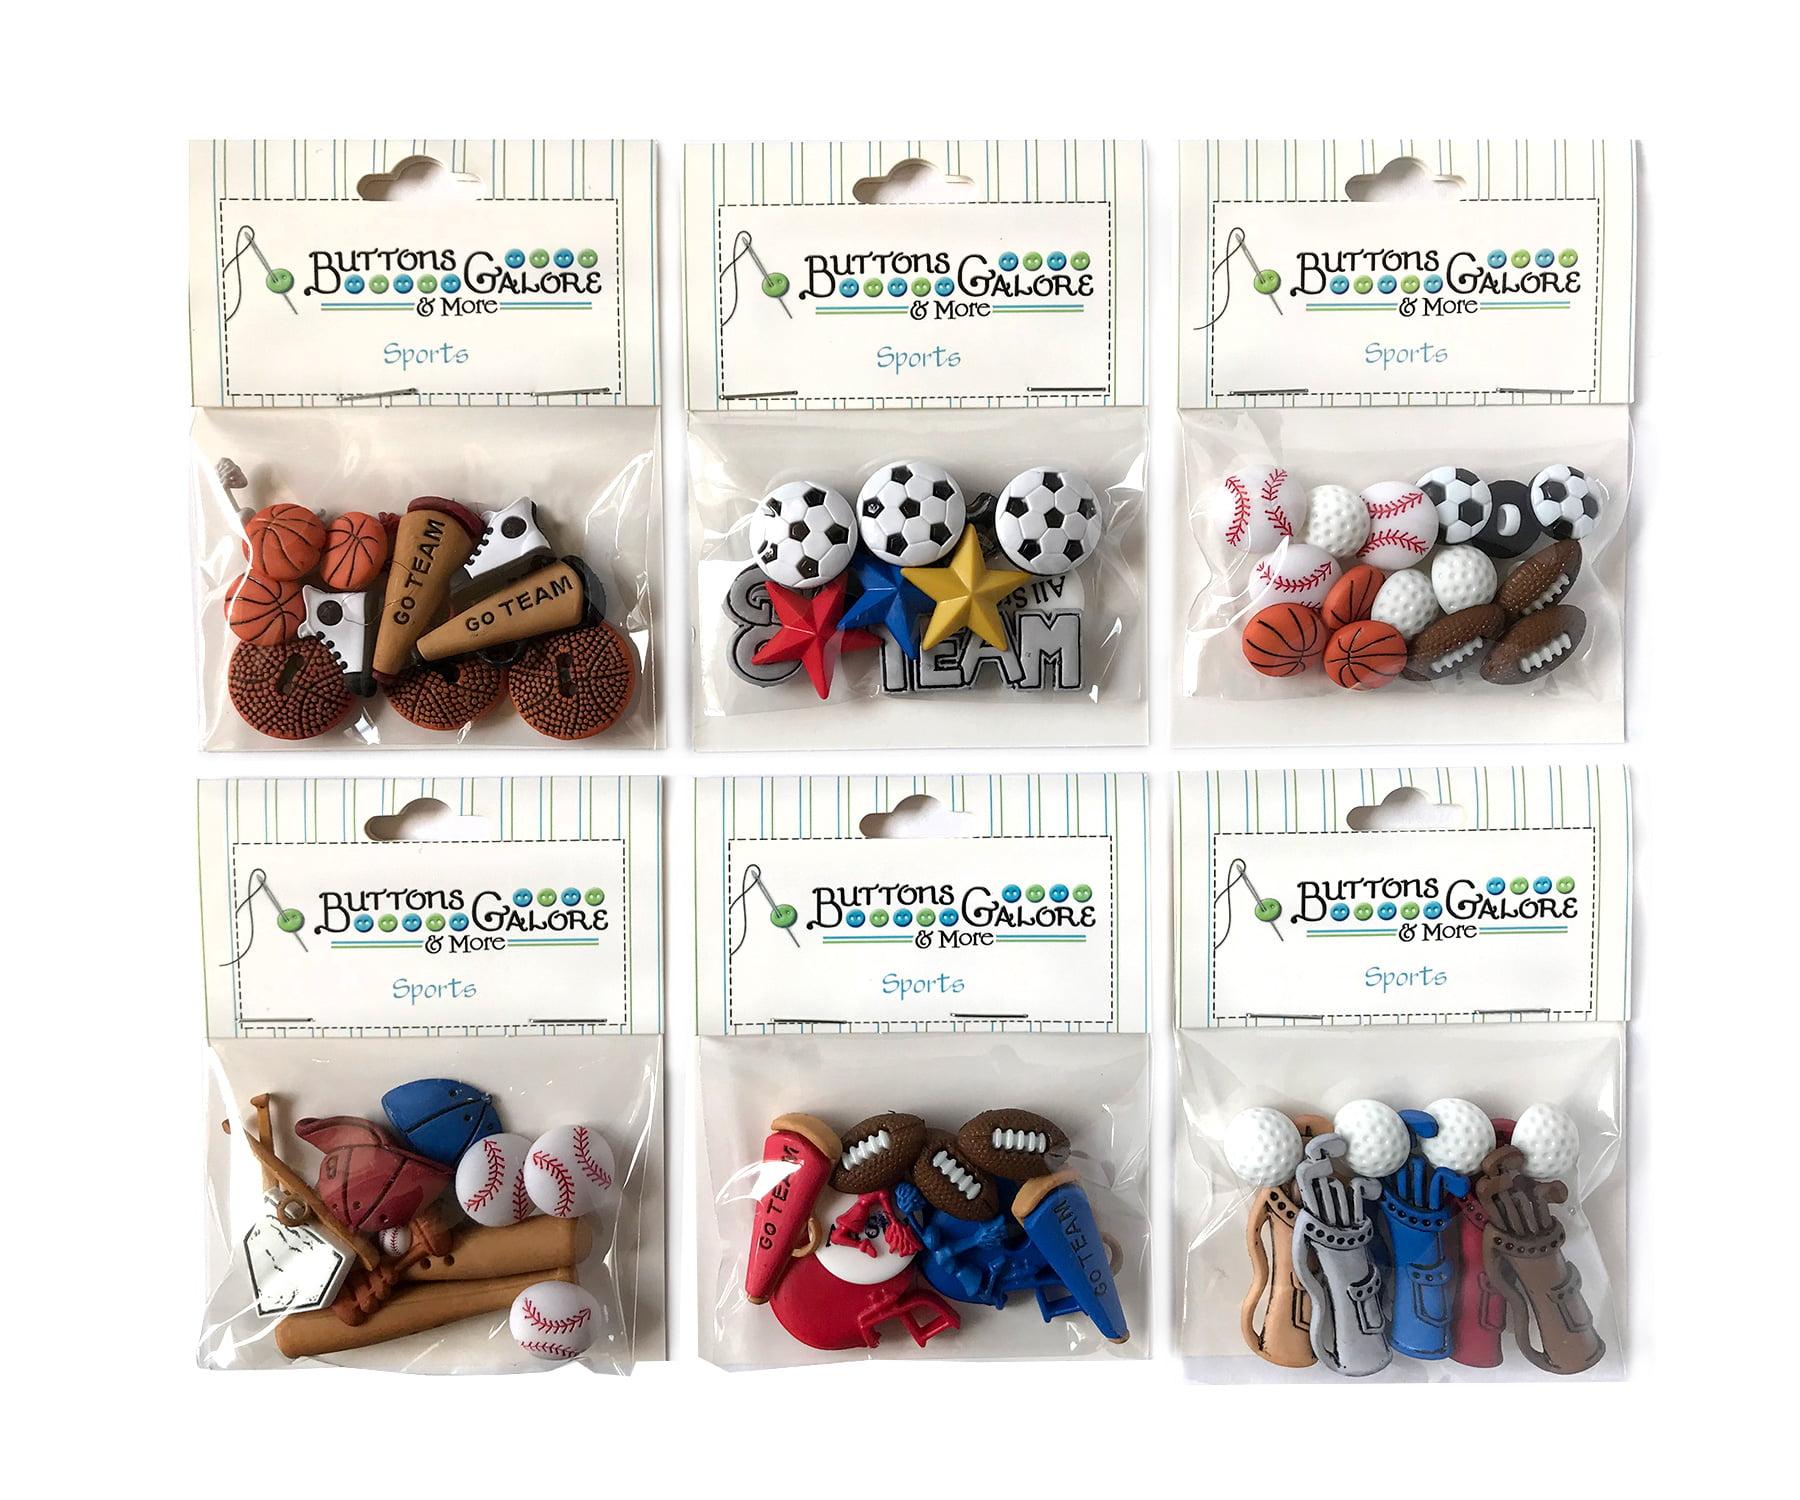 Buttons Galore Bulk Buy Craft /& Sewing Buttons Bat